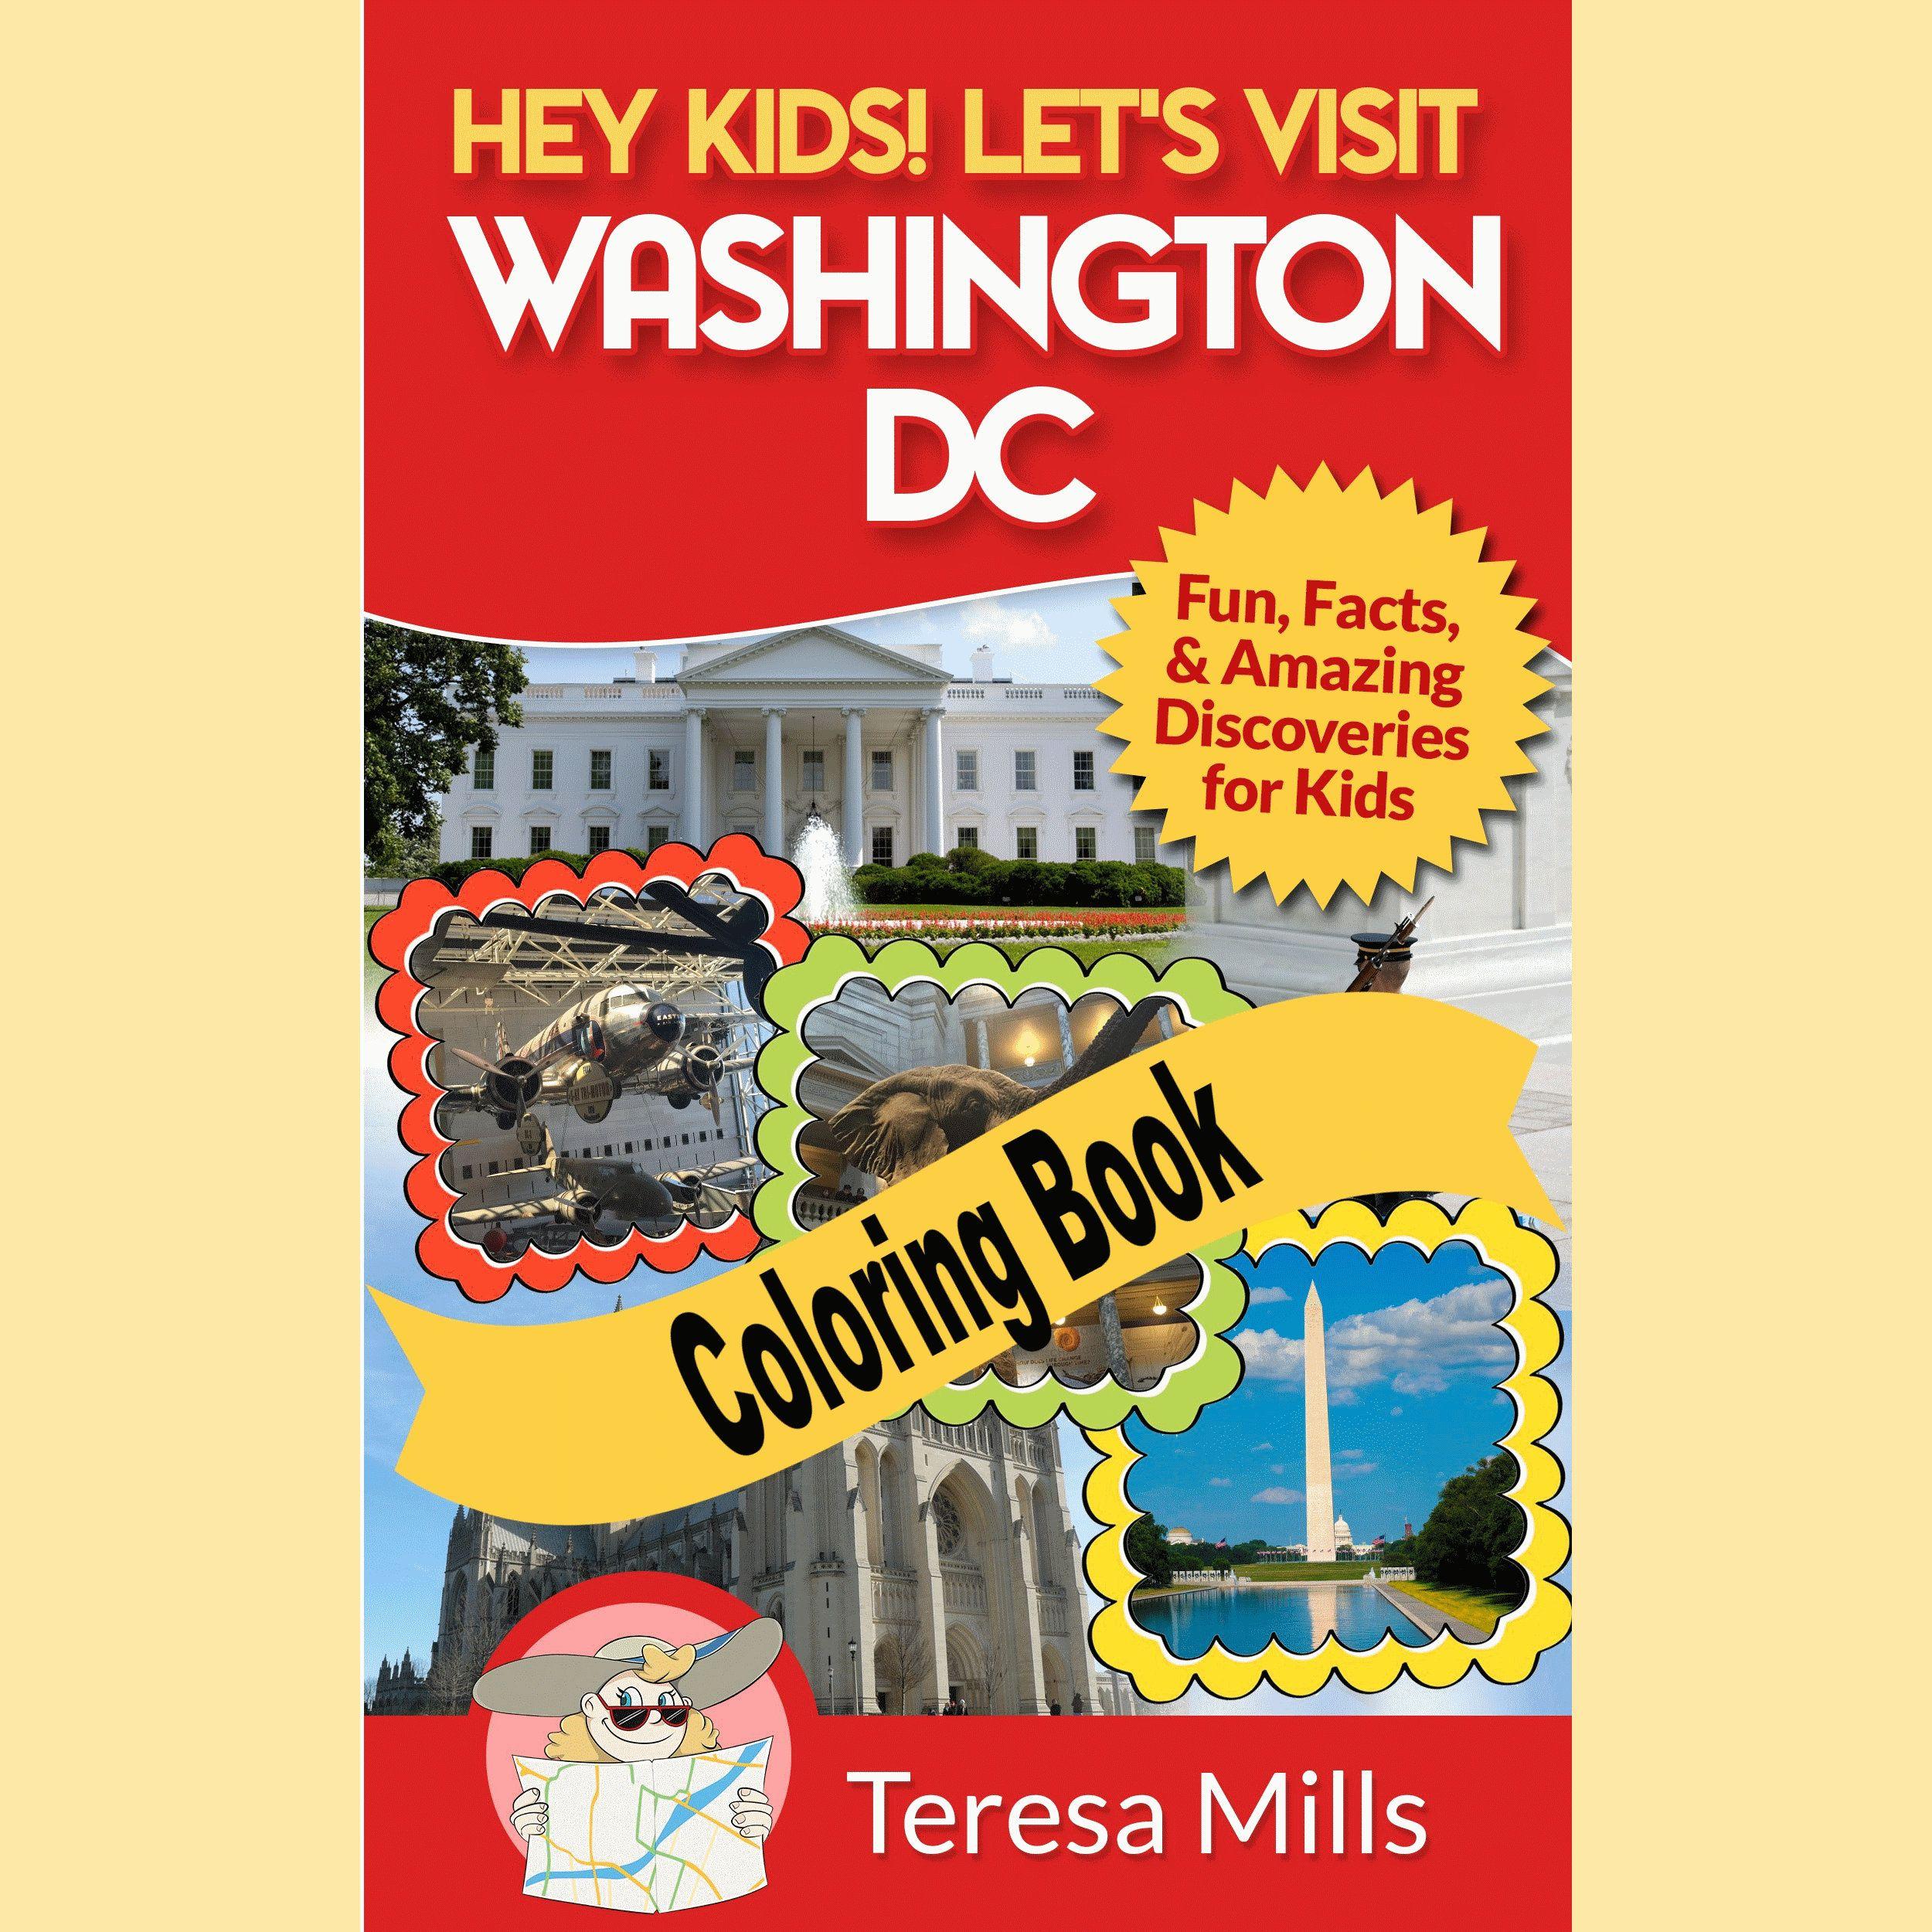 Washington Dc Coloring Book For Kids And Adults Printable